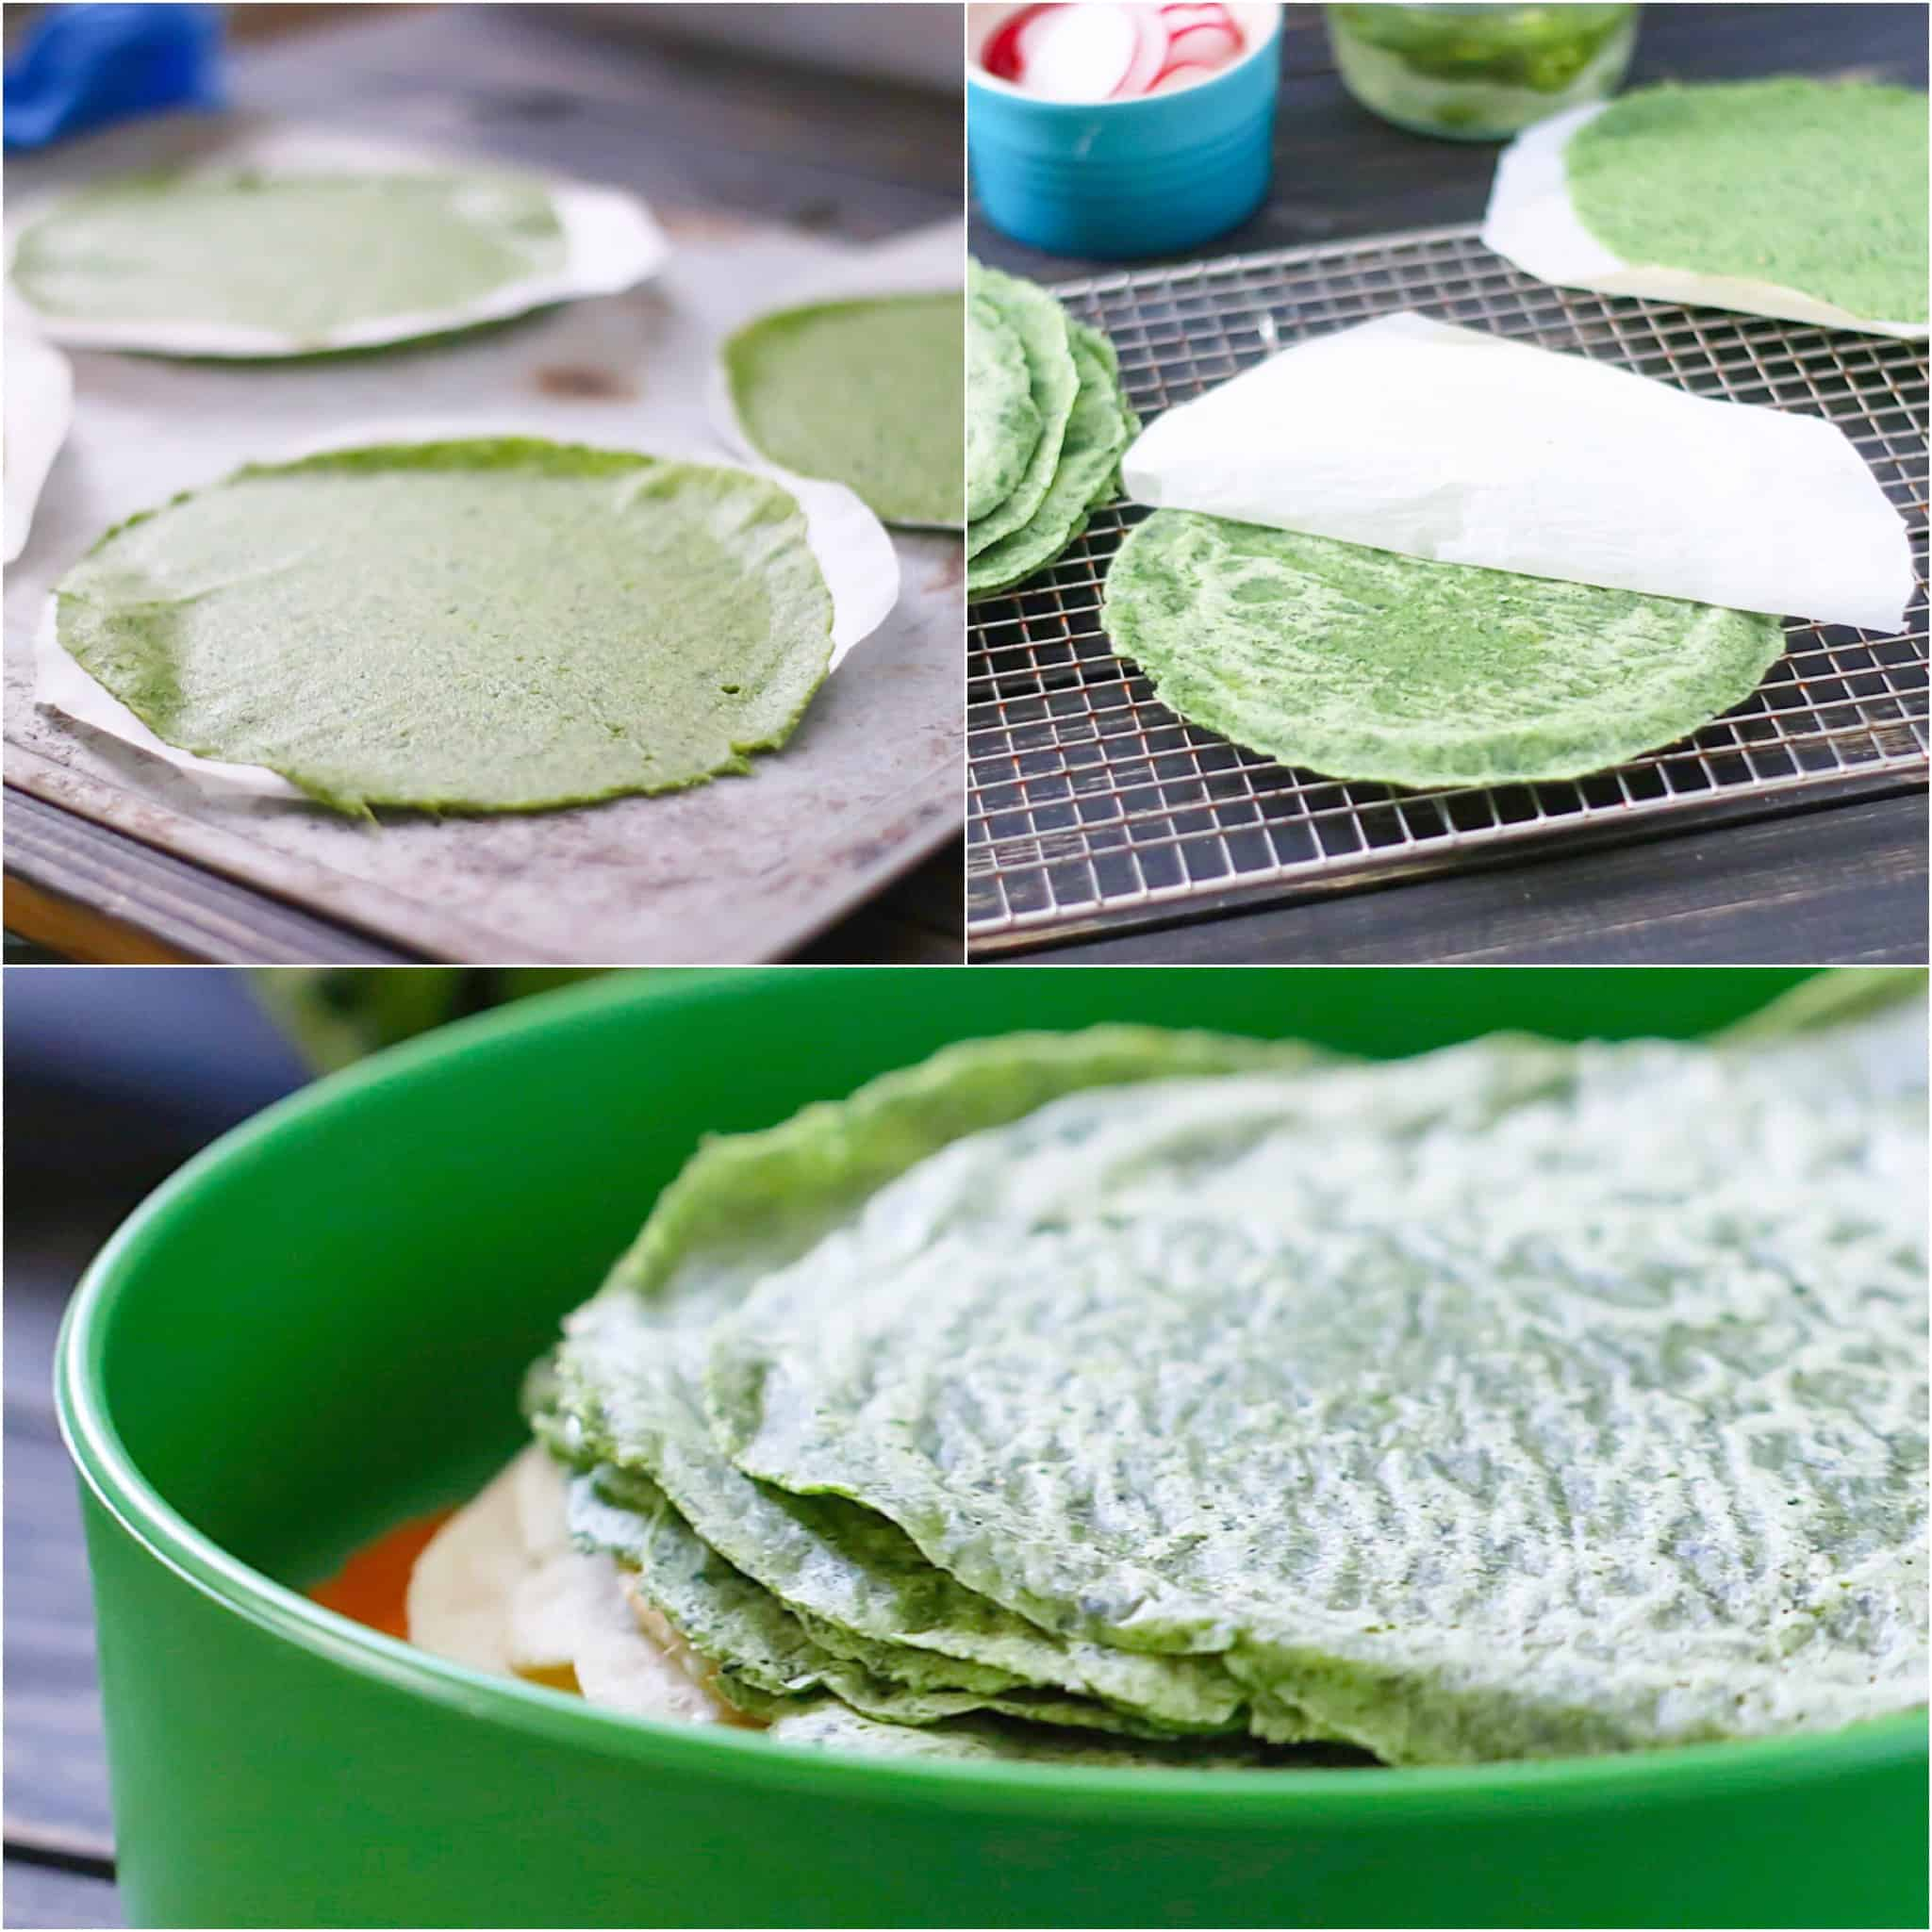 Tortilla wk 3